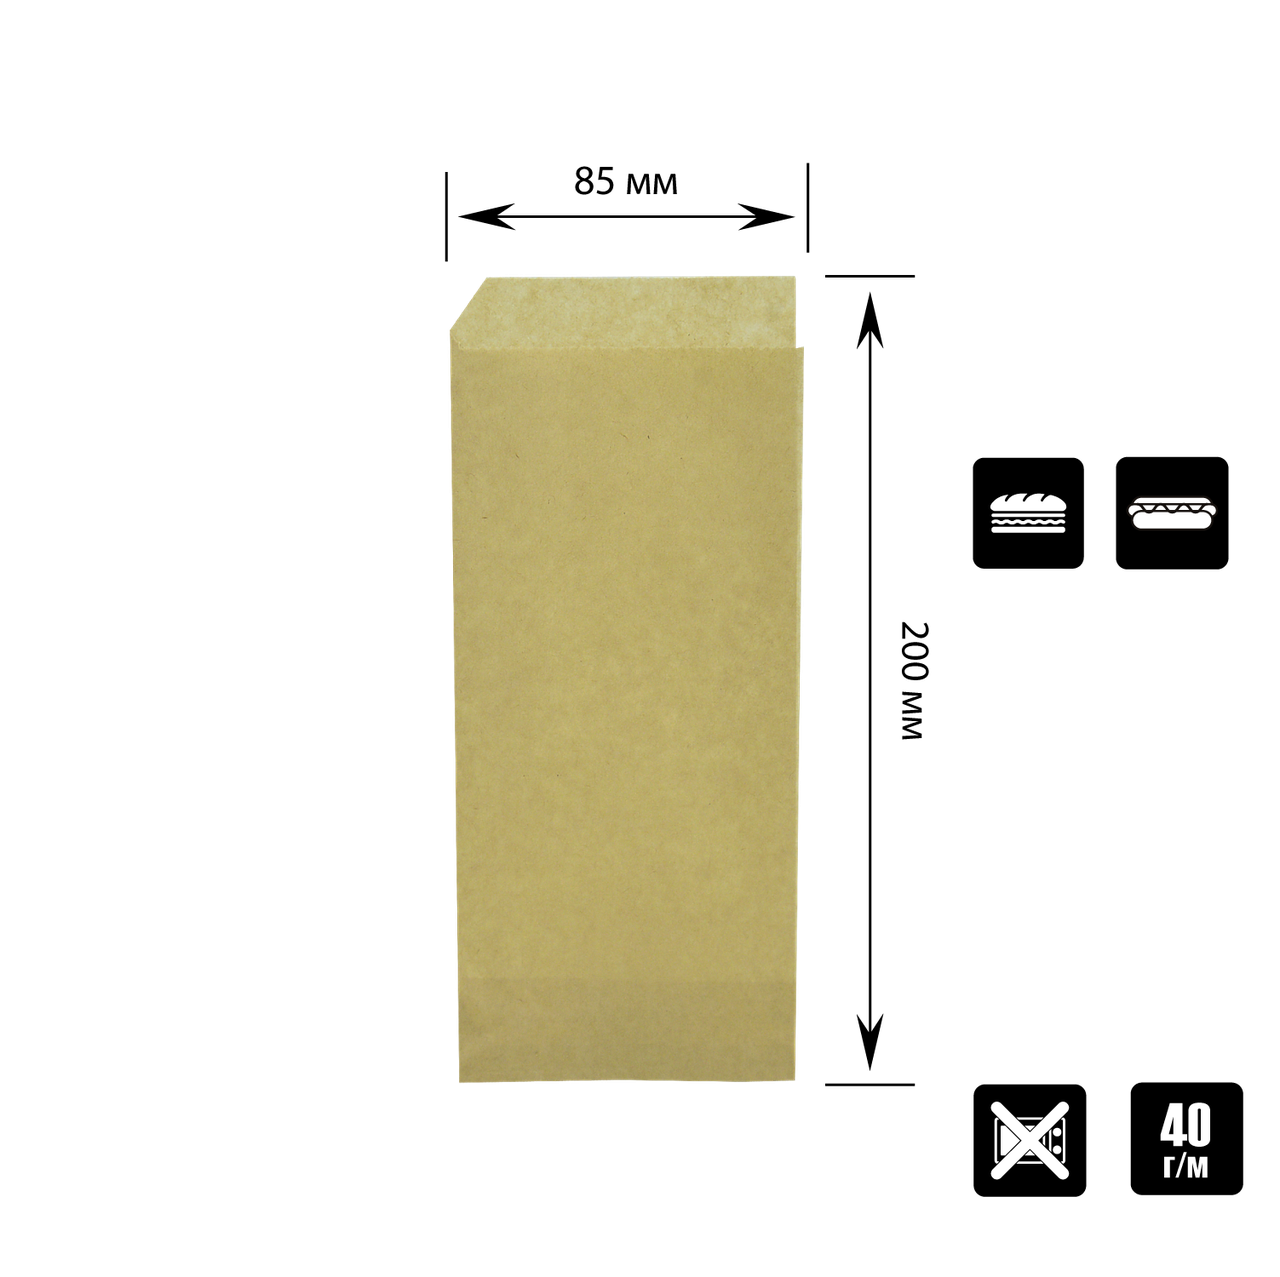 "Бумажный пакет Уголок Крафт ""Хот Дог класический"" 200х85мм (ВхШ) 40г/м² 500шт (41)"